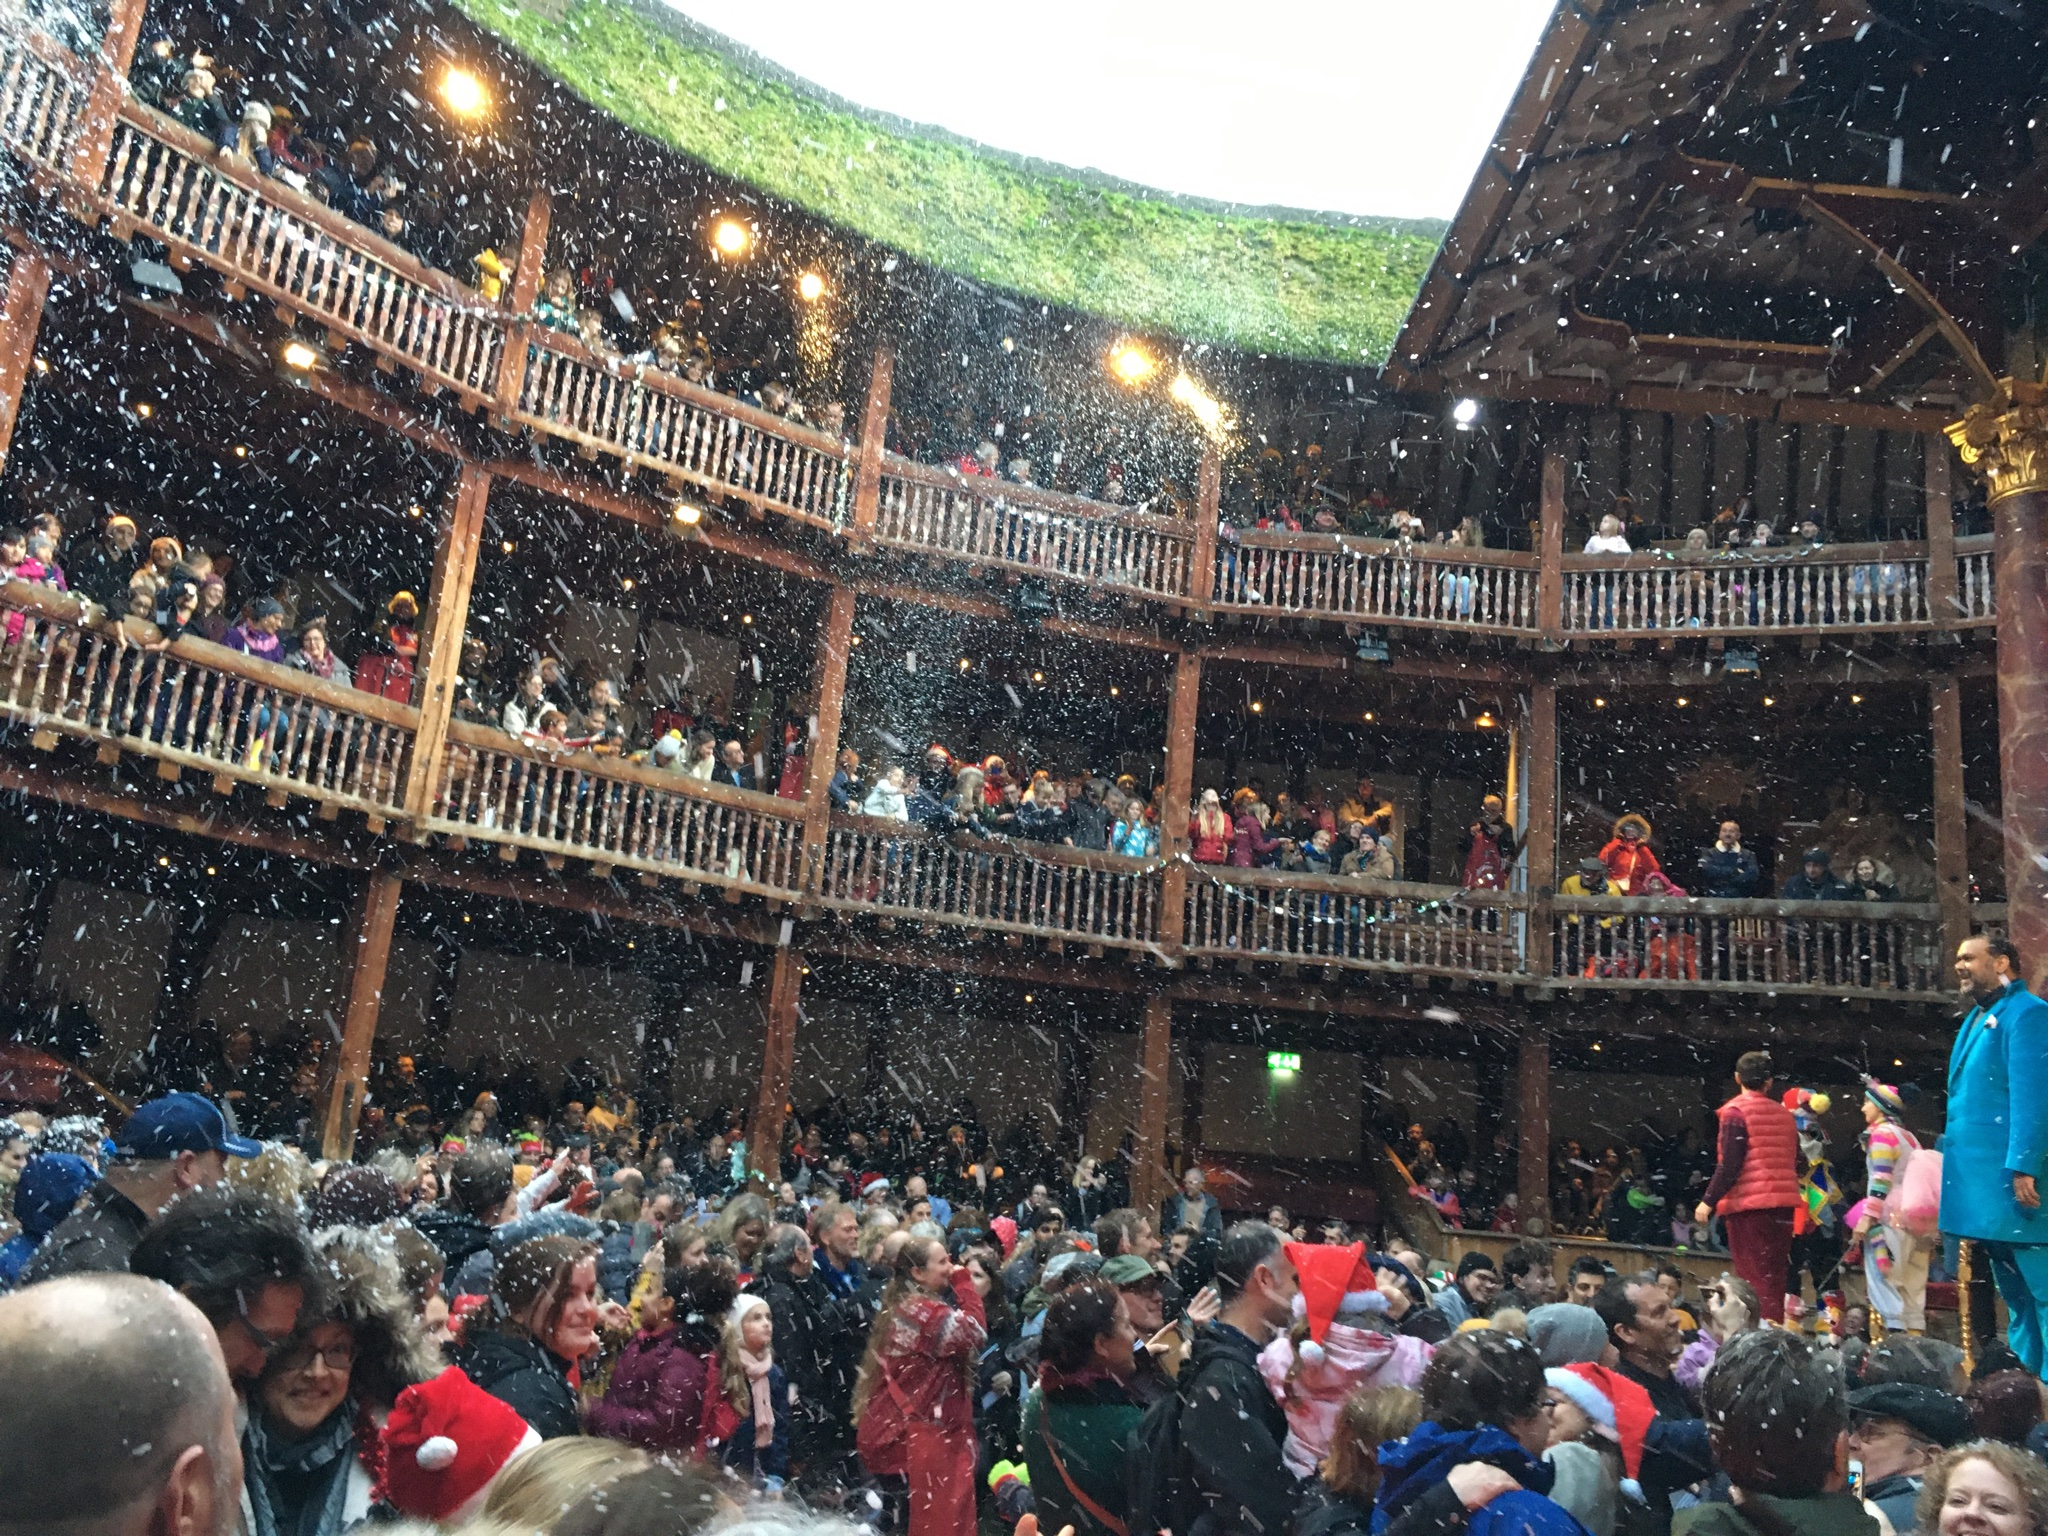 The Globe theatre full of snow